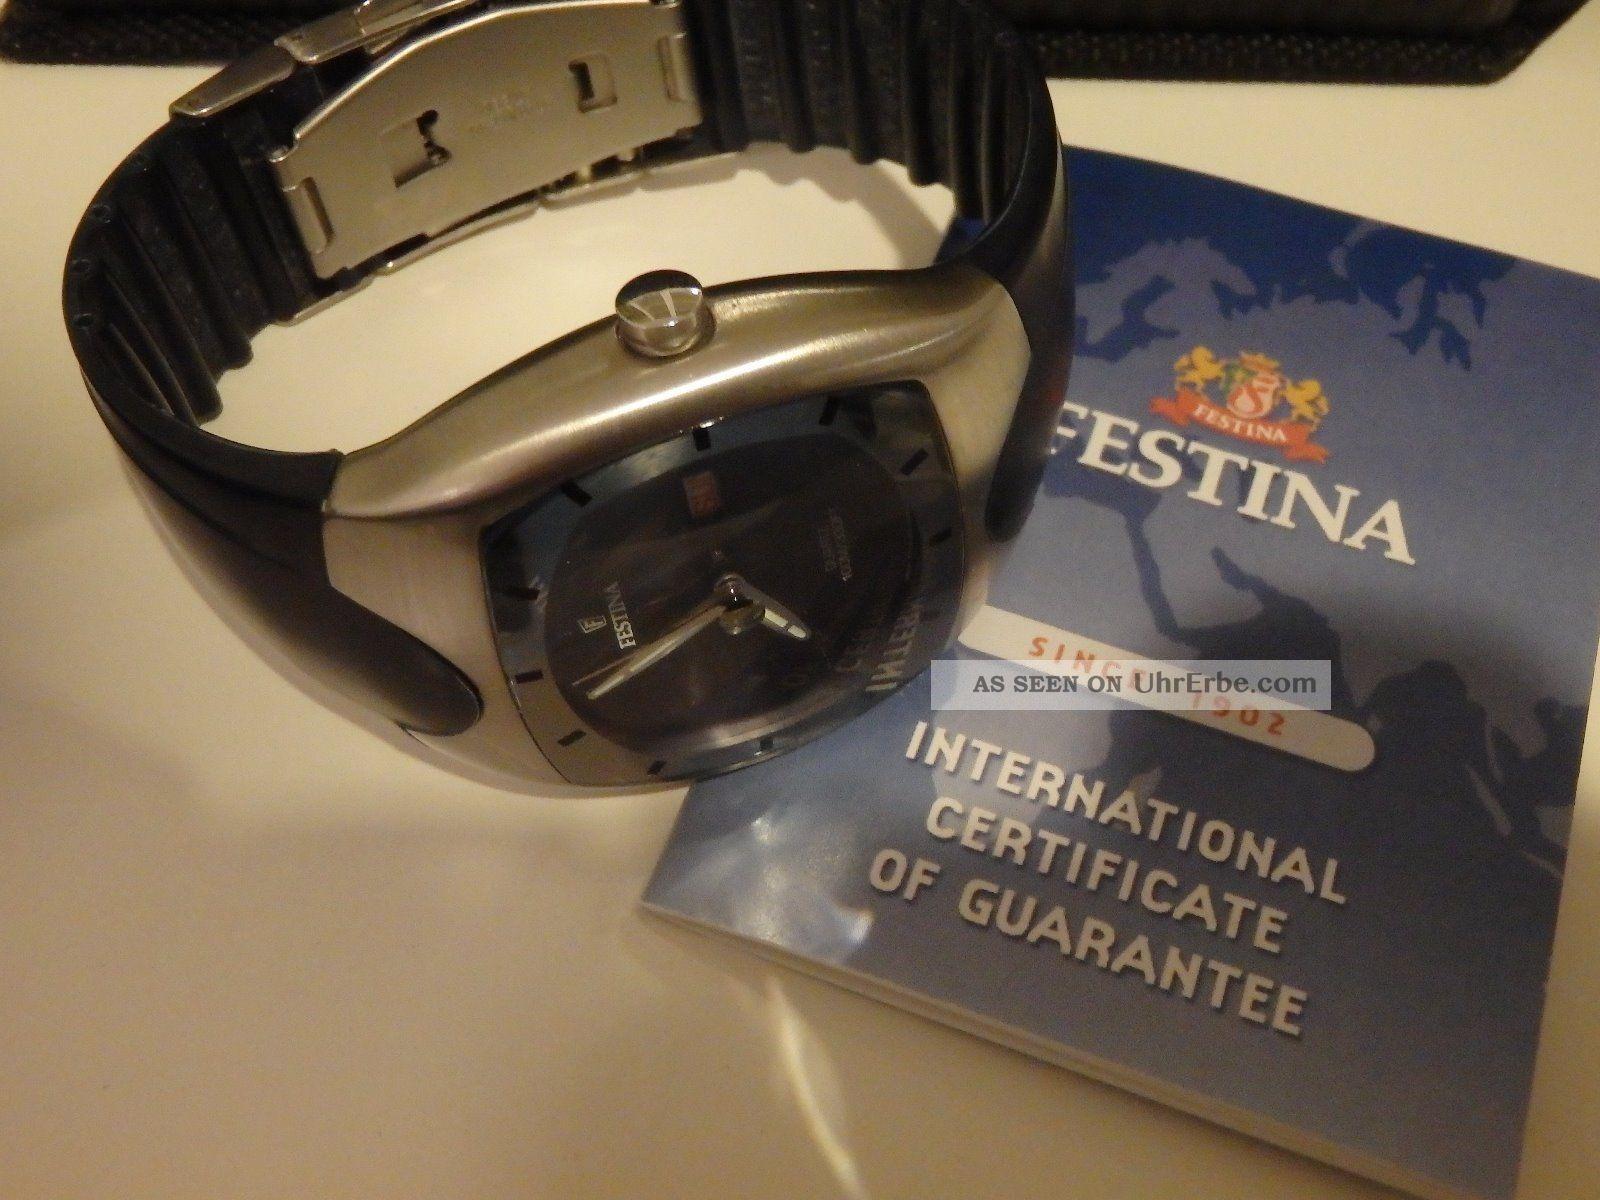 Festina Professional Herrenuhr - Registered Model 16046 - Seltenes Sammlerstück Armbanduhren Bild